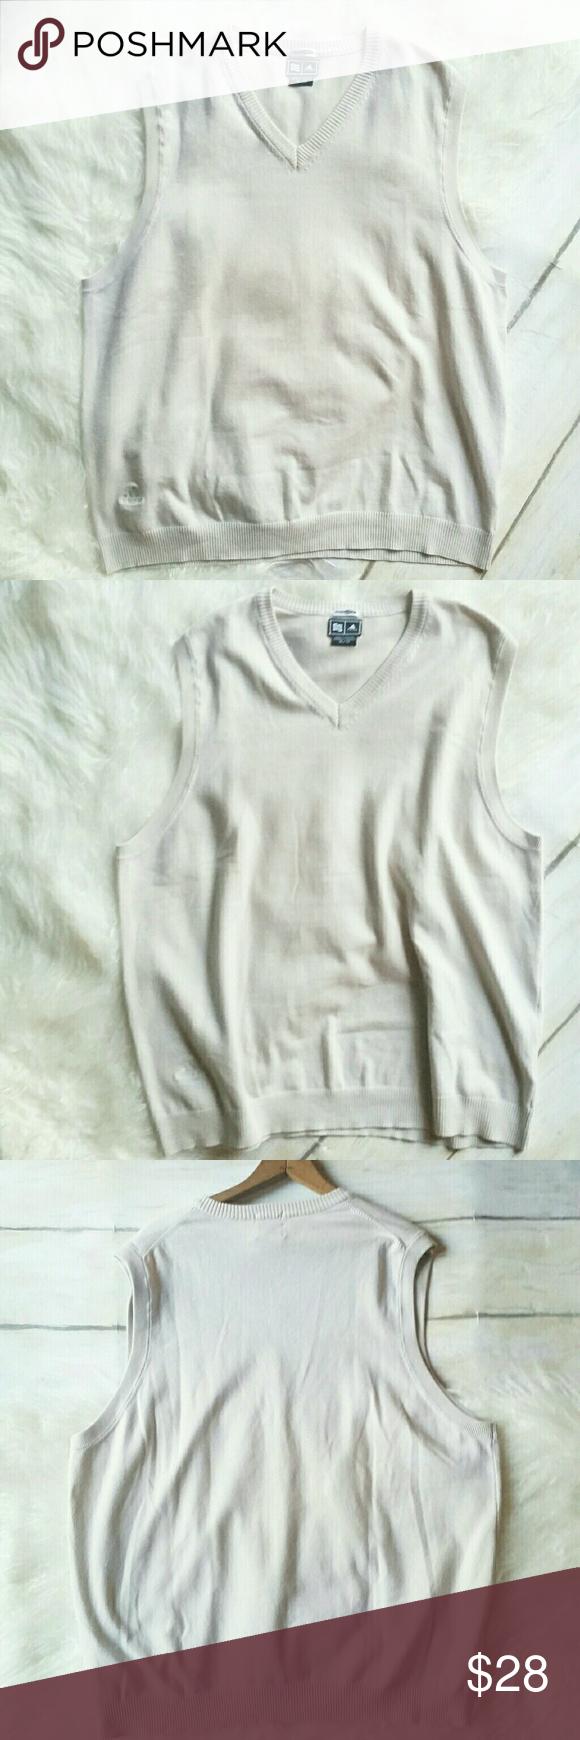 1ec0225c8e4ca ... men s Lightweight V-neck Sweater Vest in a nice